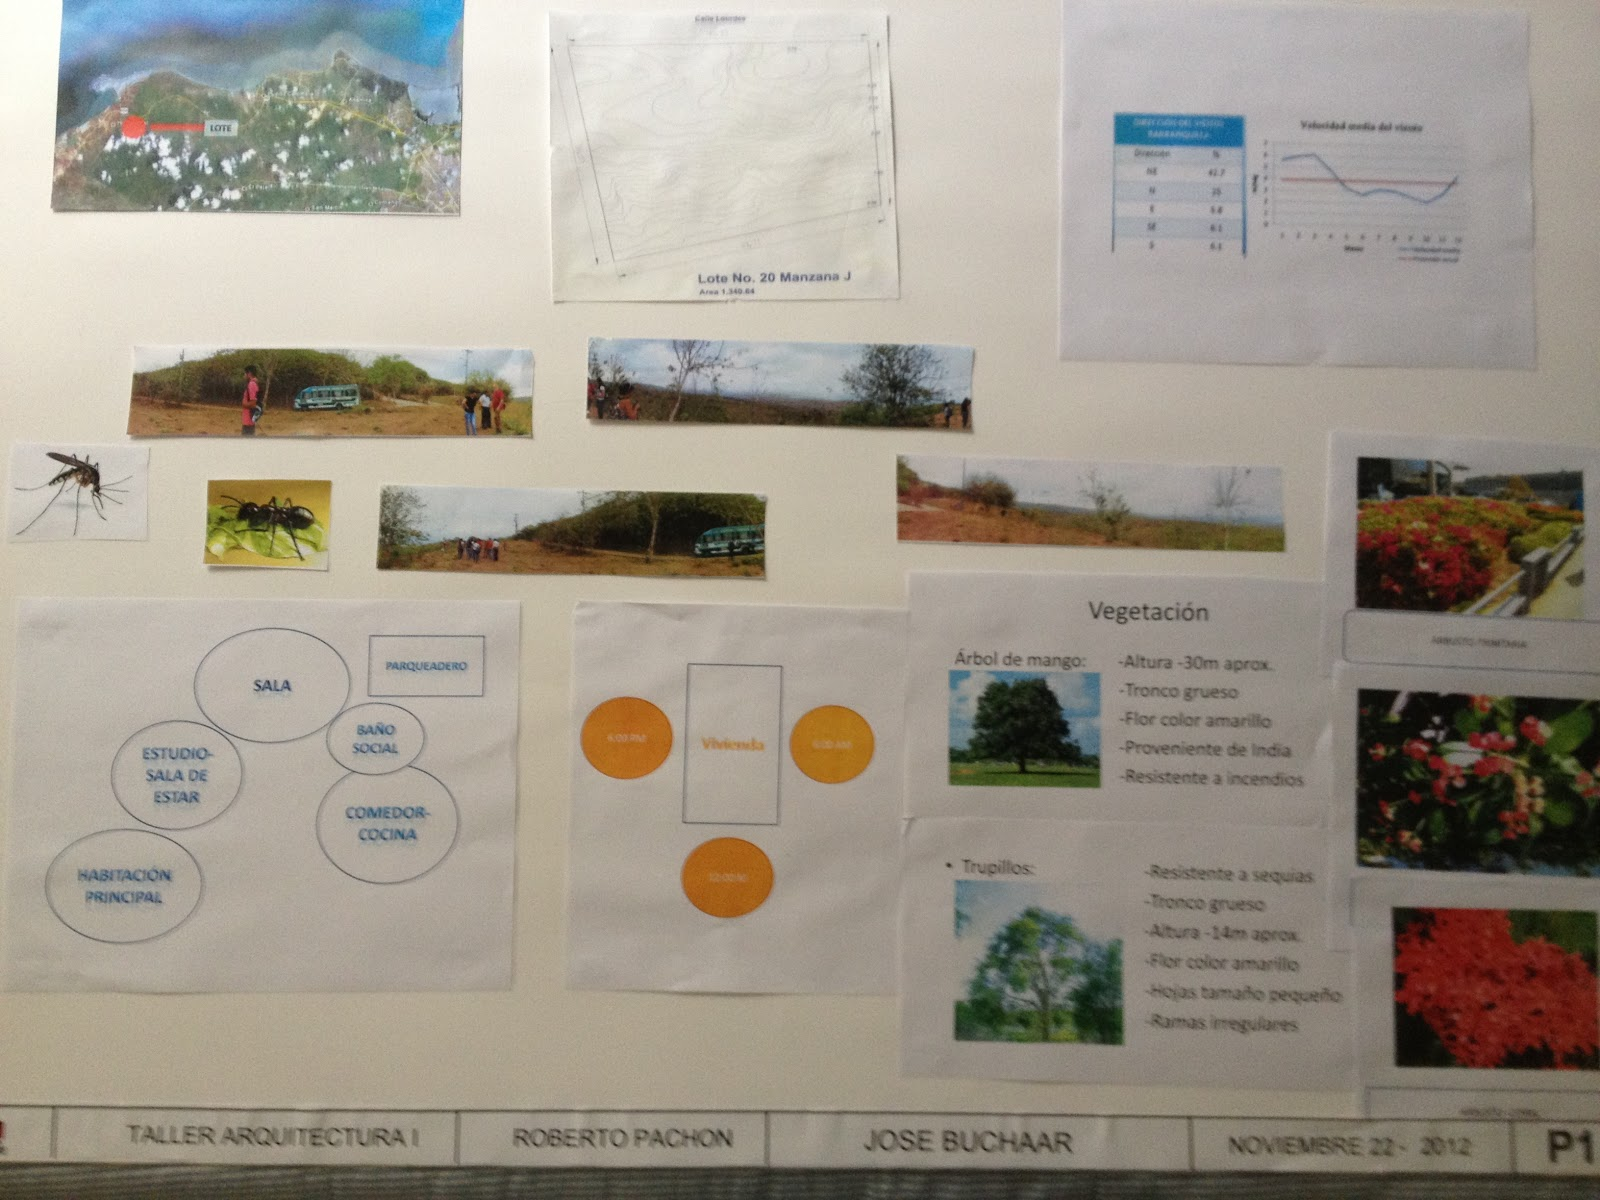 Arquitectura proyecto final casa campestre for Memoria descriptiva arquitectura